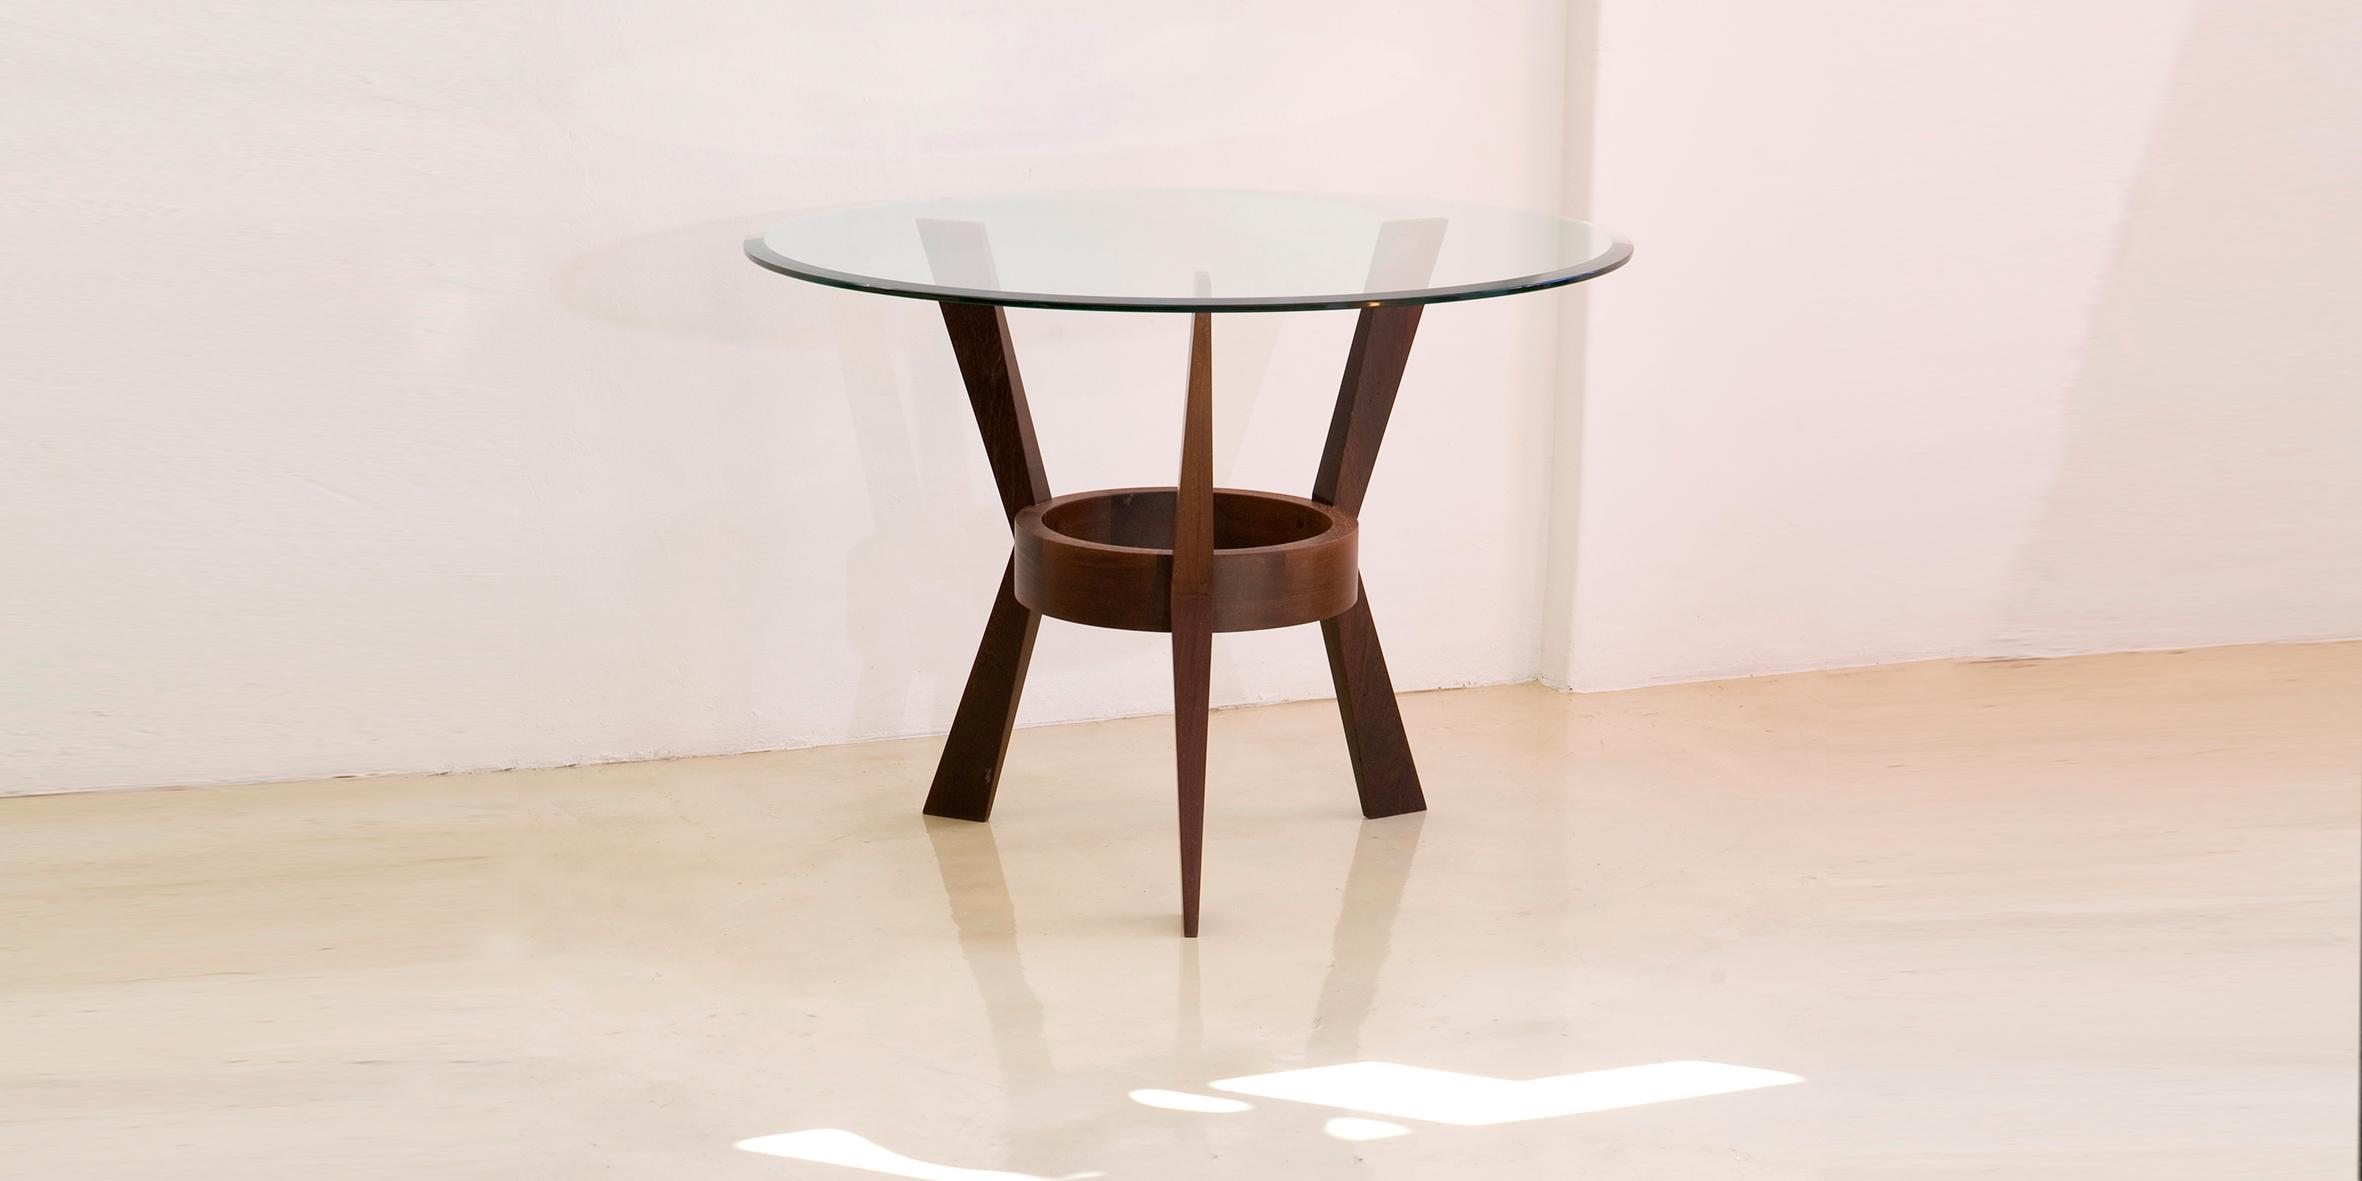 crane leg table, 730 h x 1100 dia, wenge